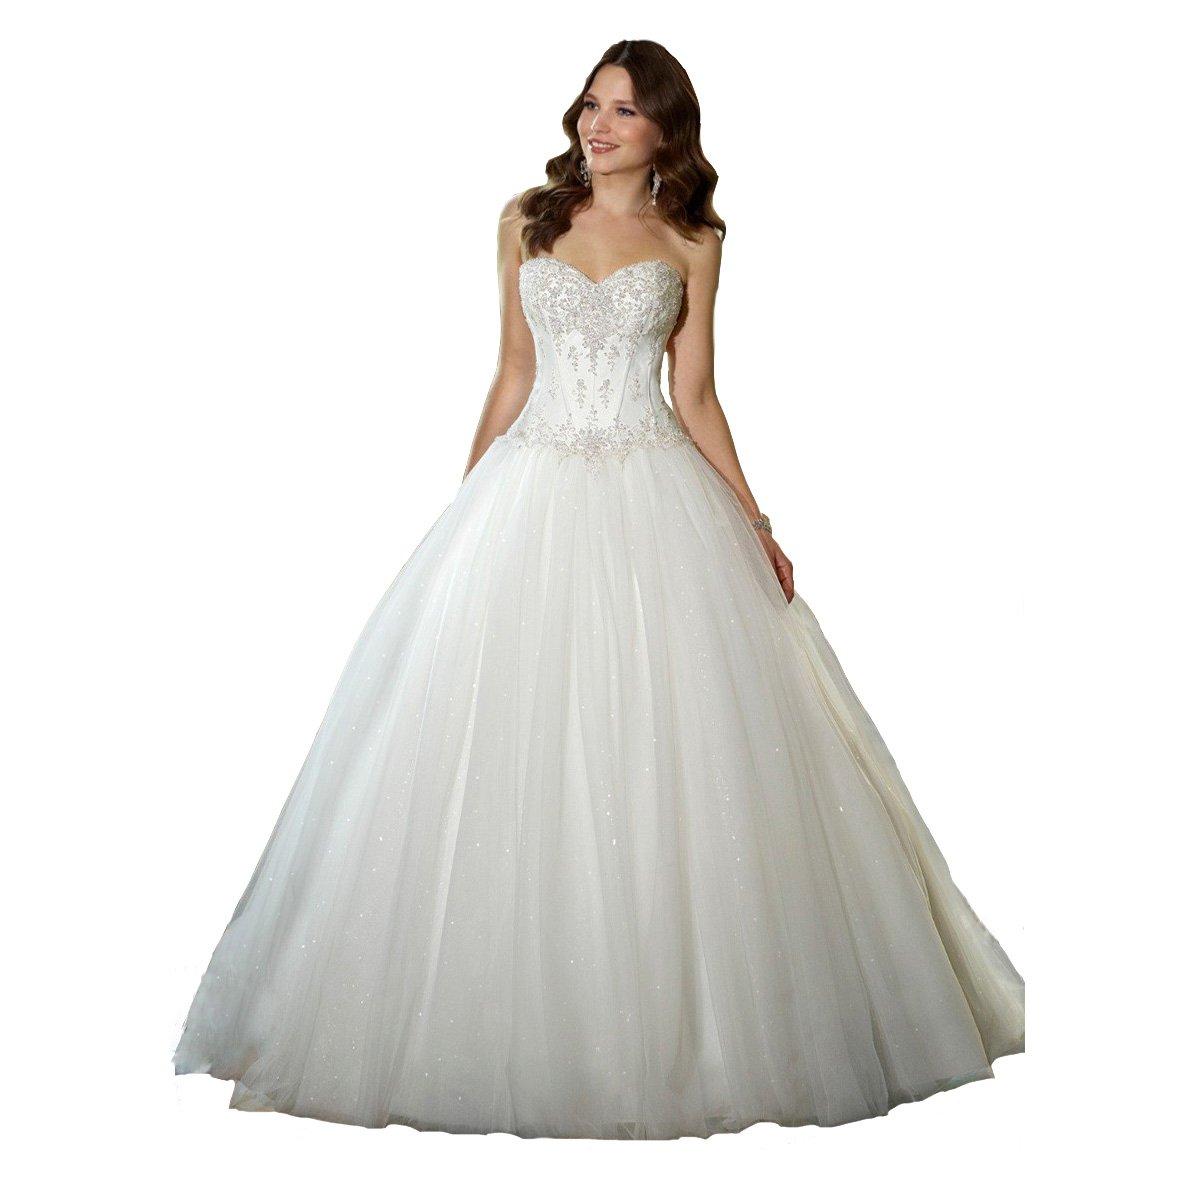 YIPEISHA Sweetheart Beaded Corset Bodice Classic Tulle Wedding Dress product image